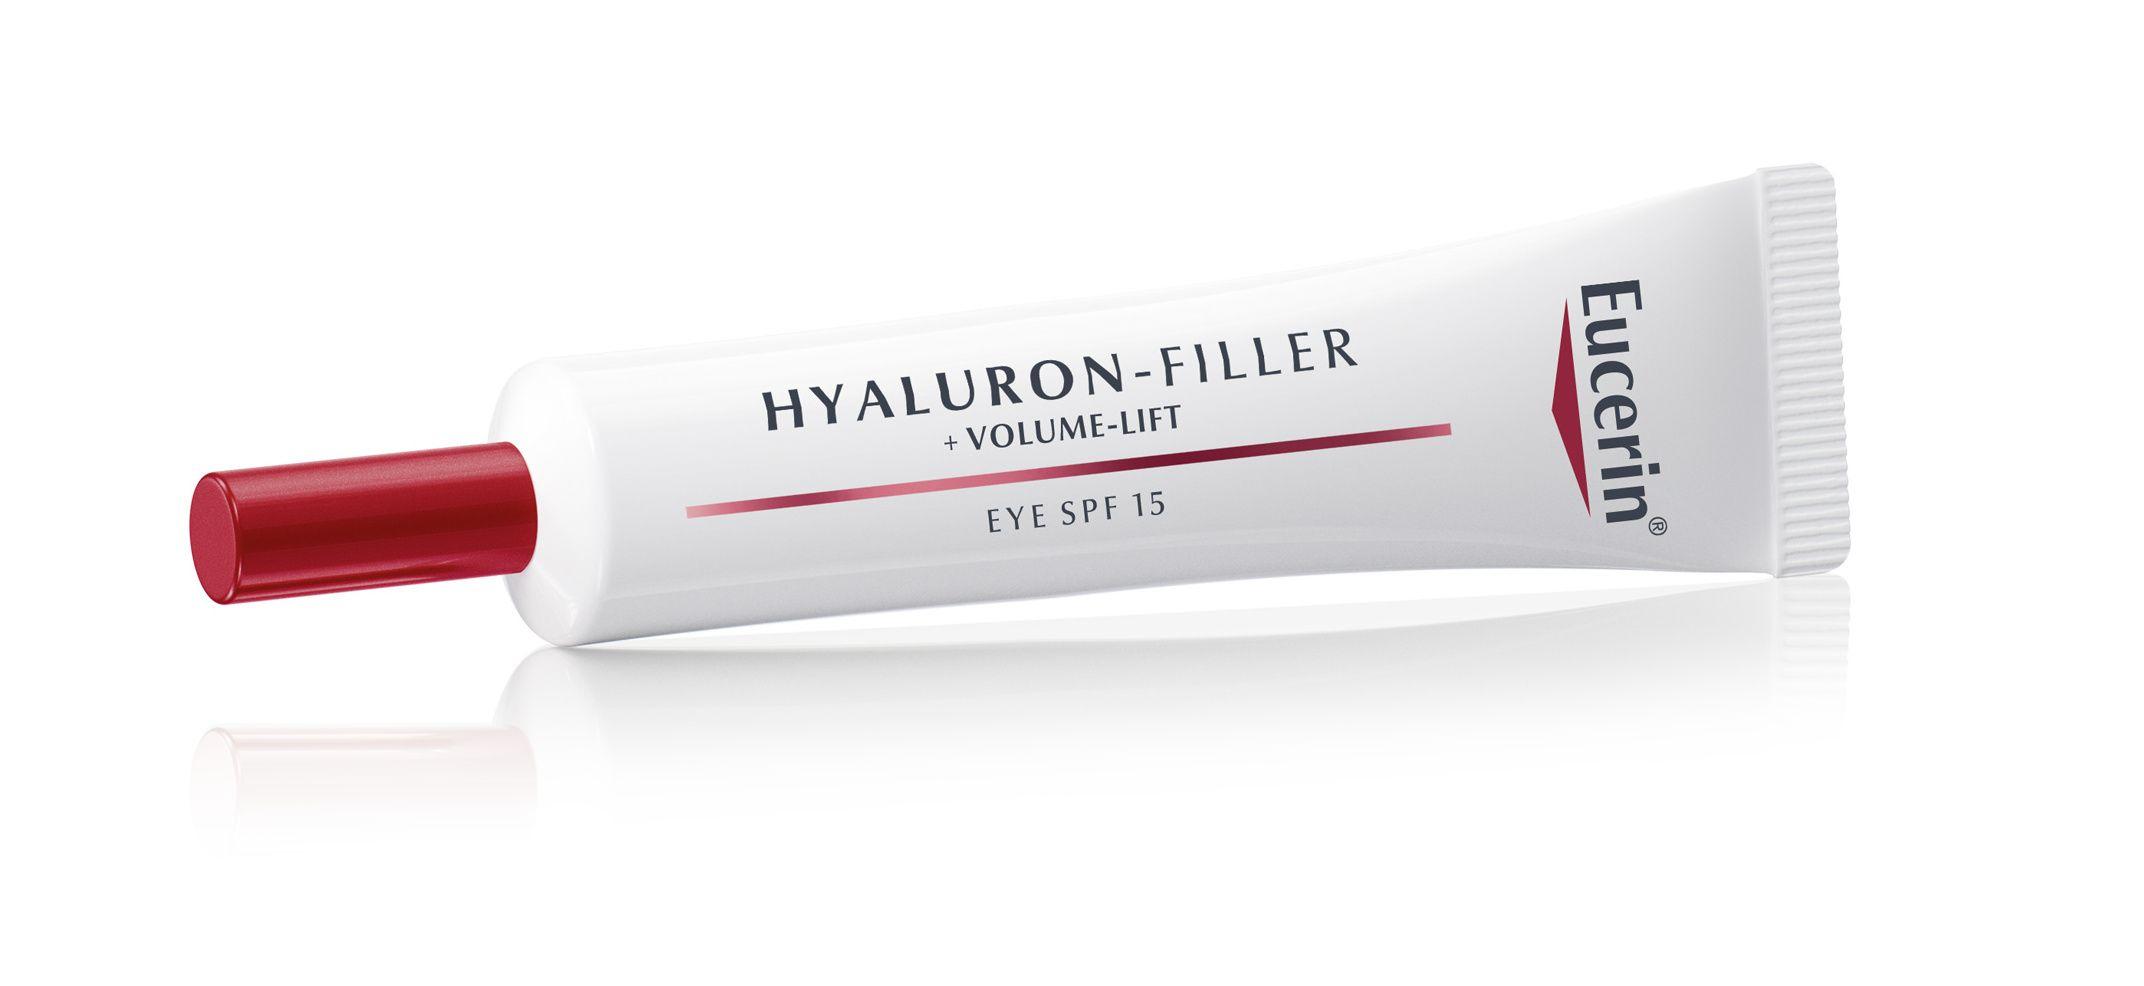 Eucerin Hyaluron-Filler + Volume-Lift oční krém 15 ml